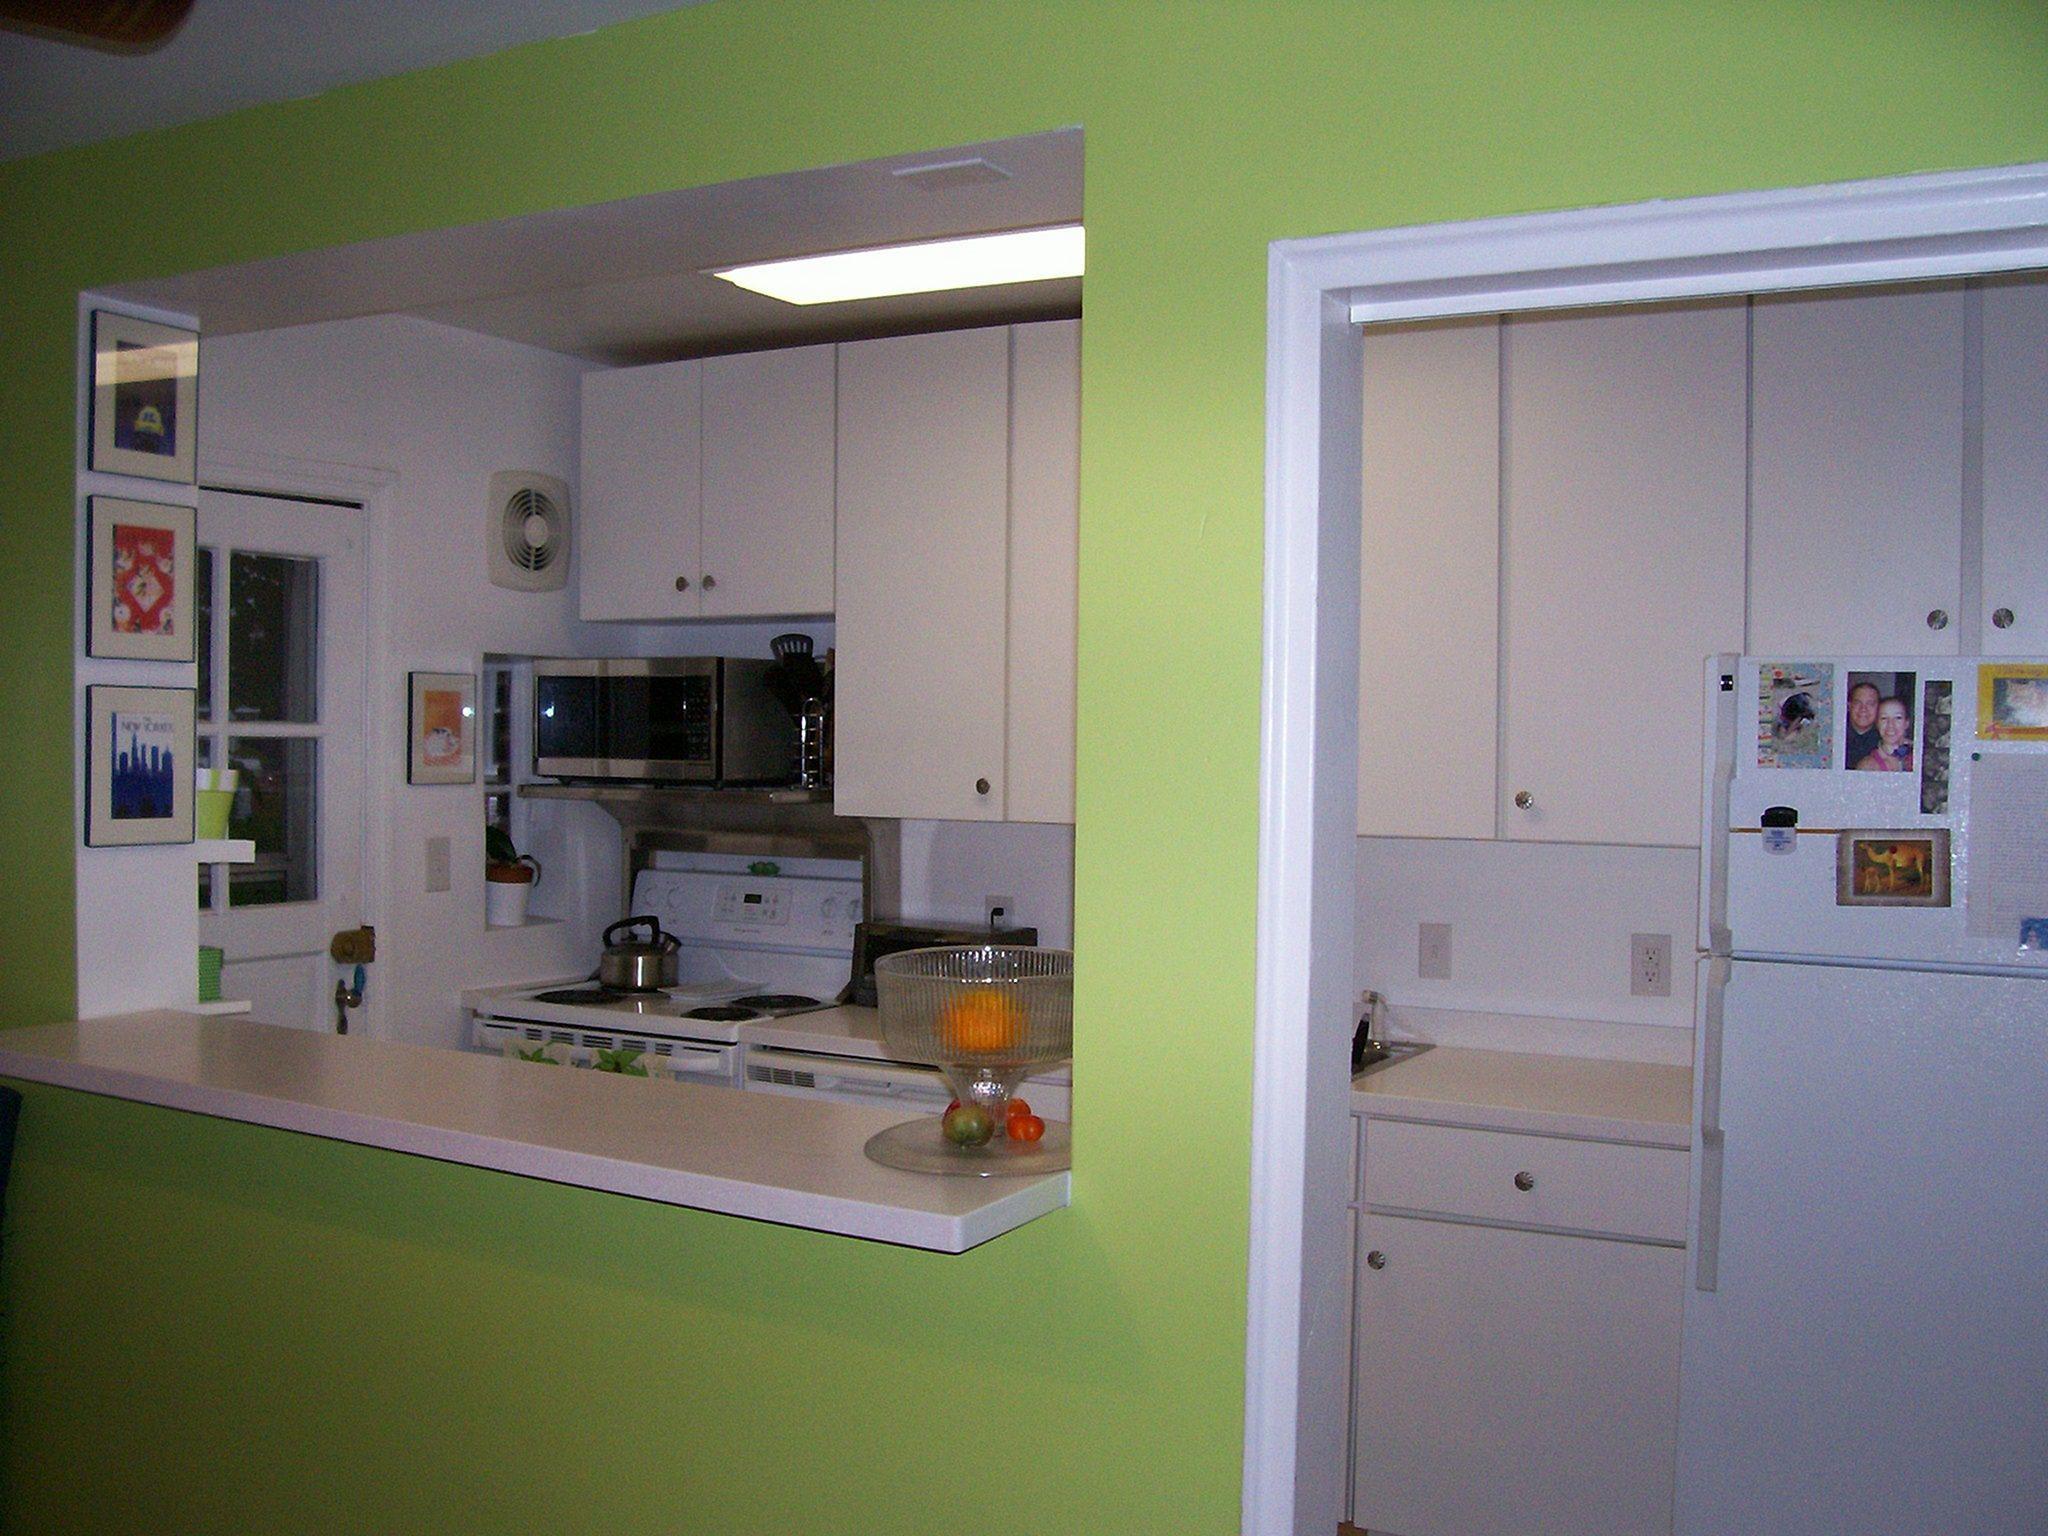 60 Awesome Kitchen Countertop Bar Designs Ideas For Your Elegant Kitchen Freshouz Com Kitchen Bar Design Small Kitchen Bar Modern Kitchen Design